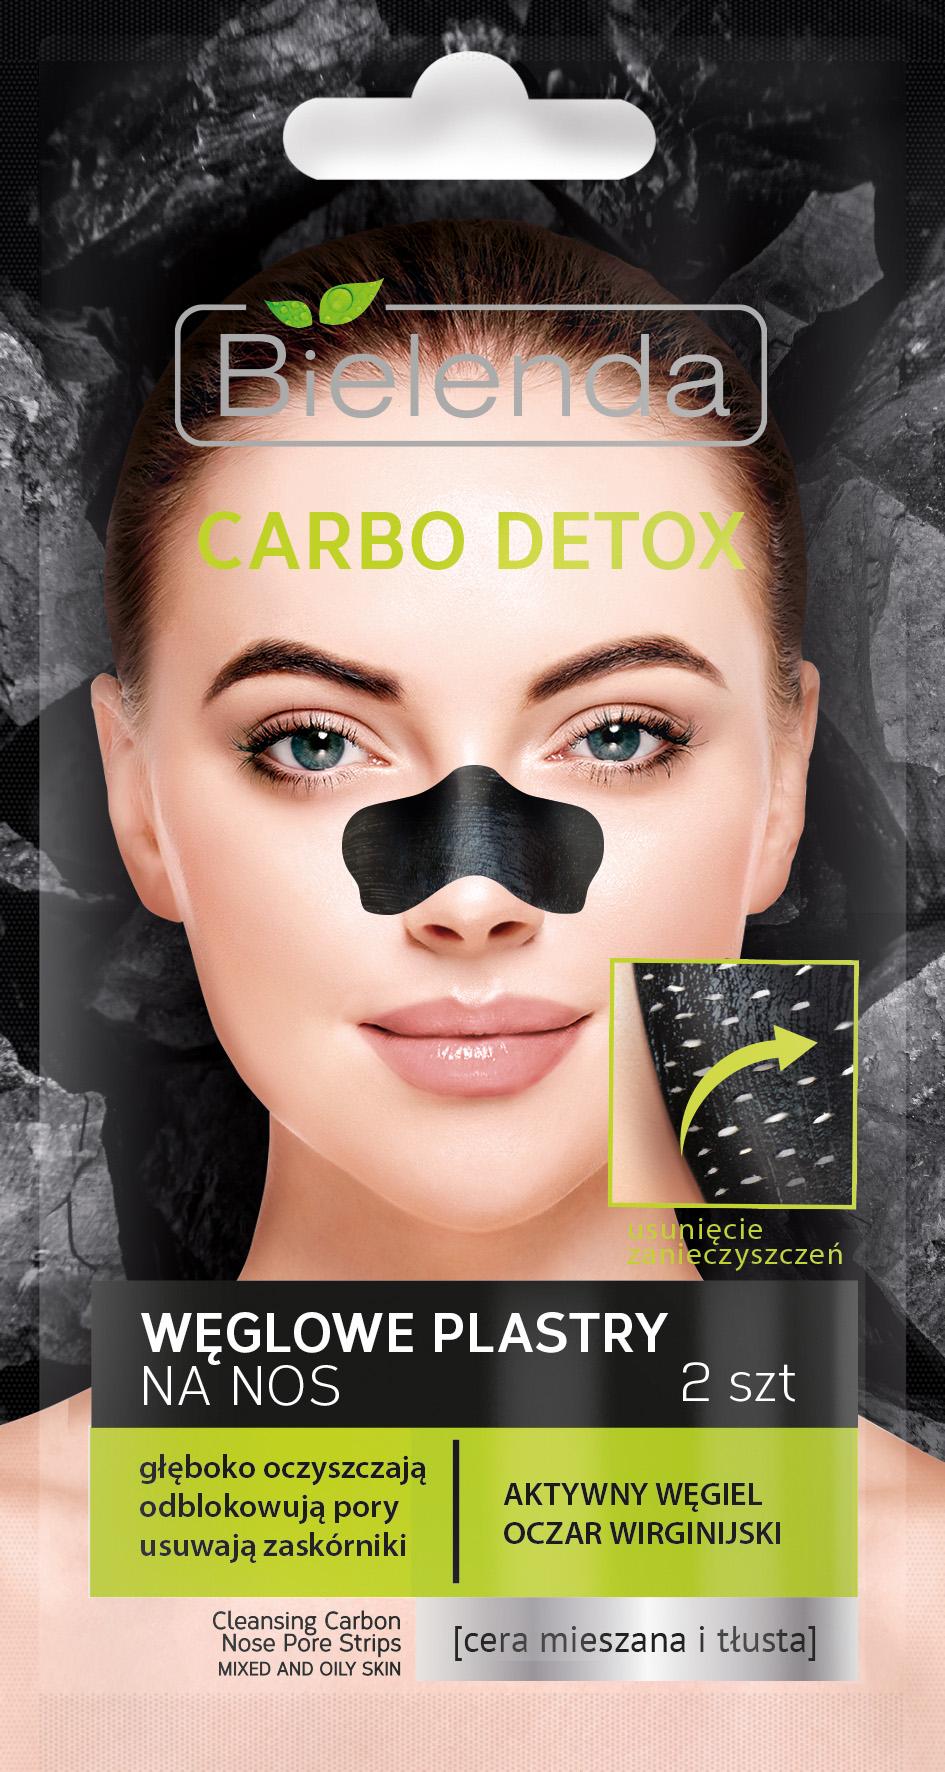 Bielenda Carbo Detox Weglowe Plastry Na Nos 2szt 7153767029 Allegro Pl